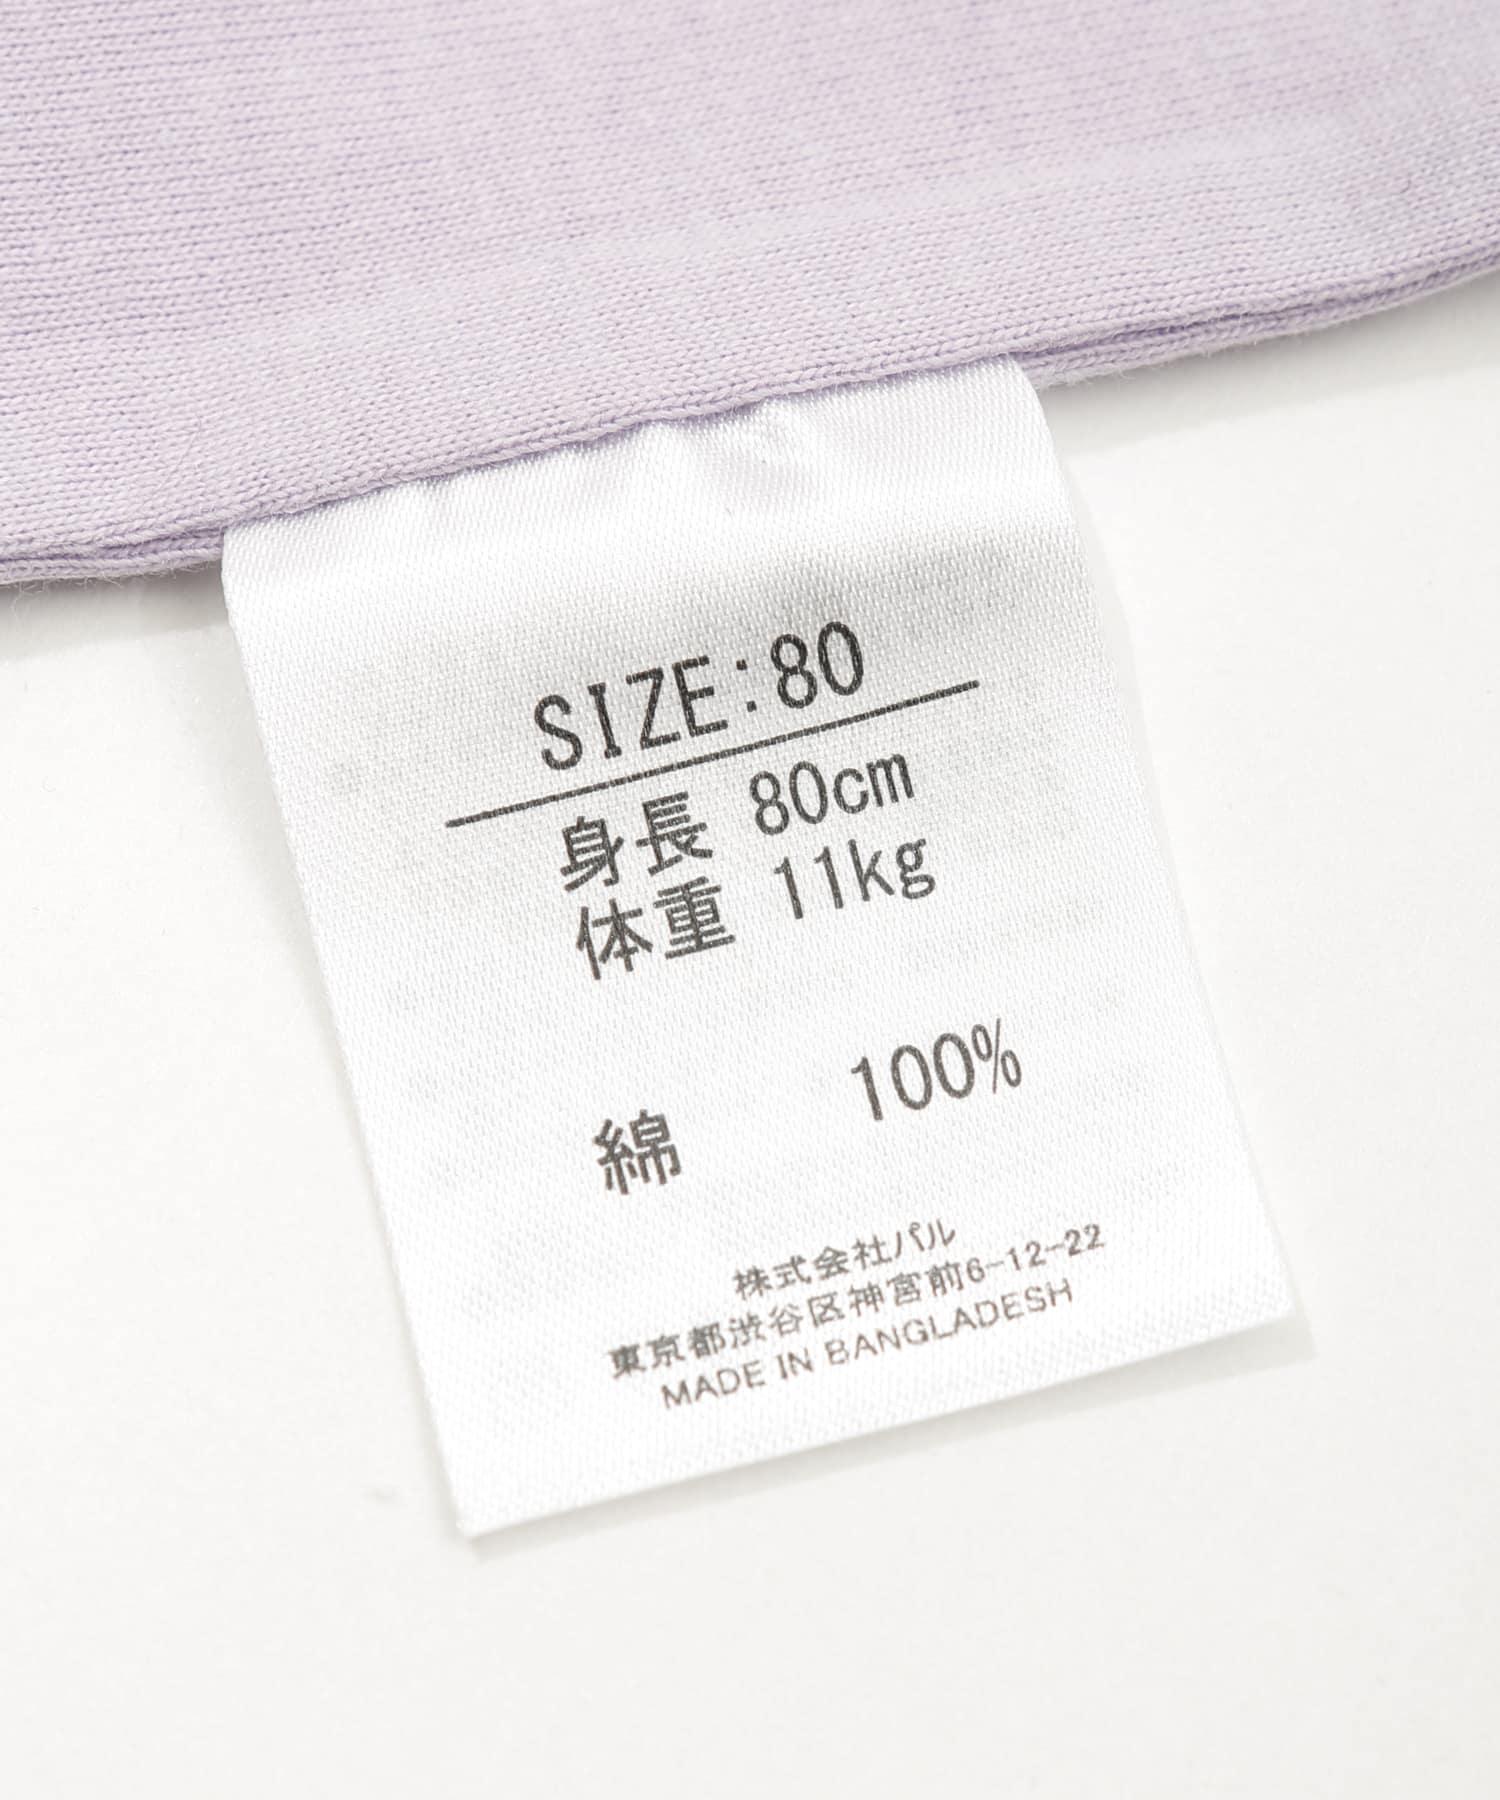 3COINS(スリーコインズ) 【おめかし・一部店舗限定】ボディスーツ 80㎝